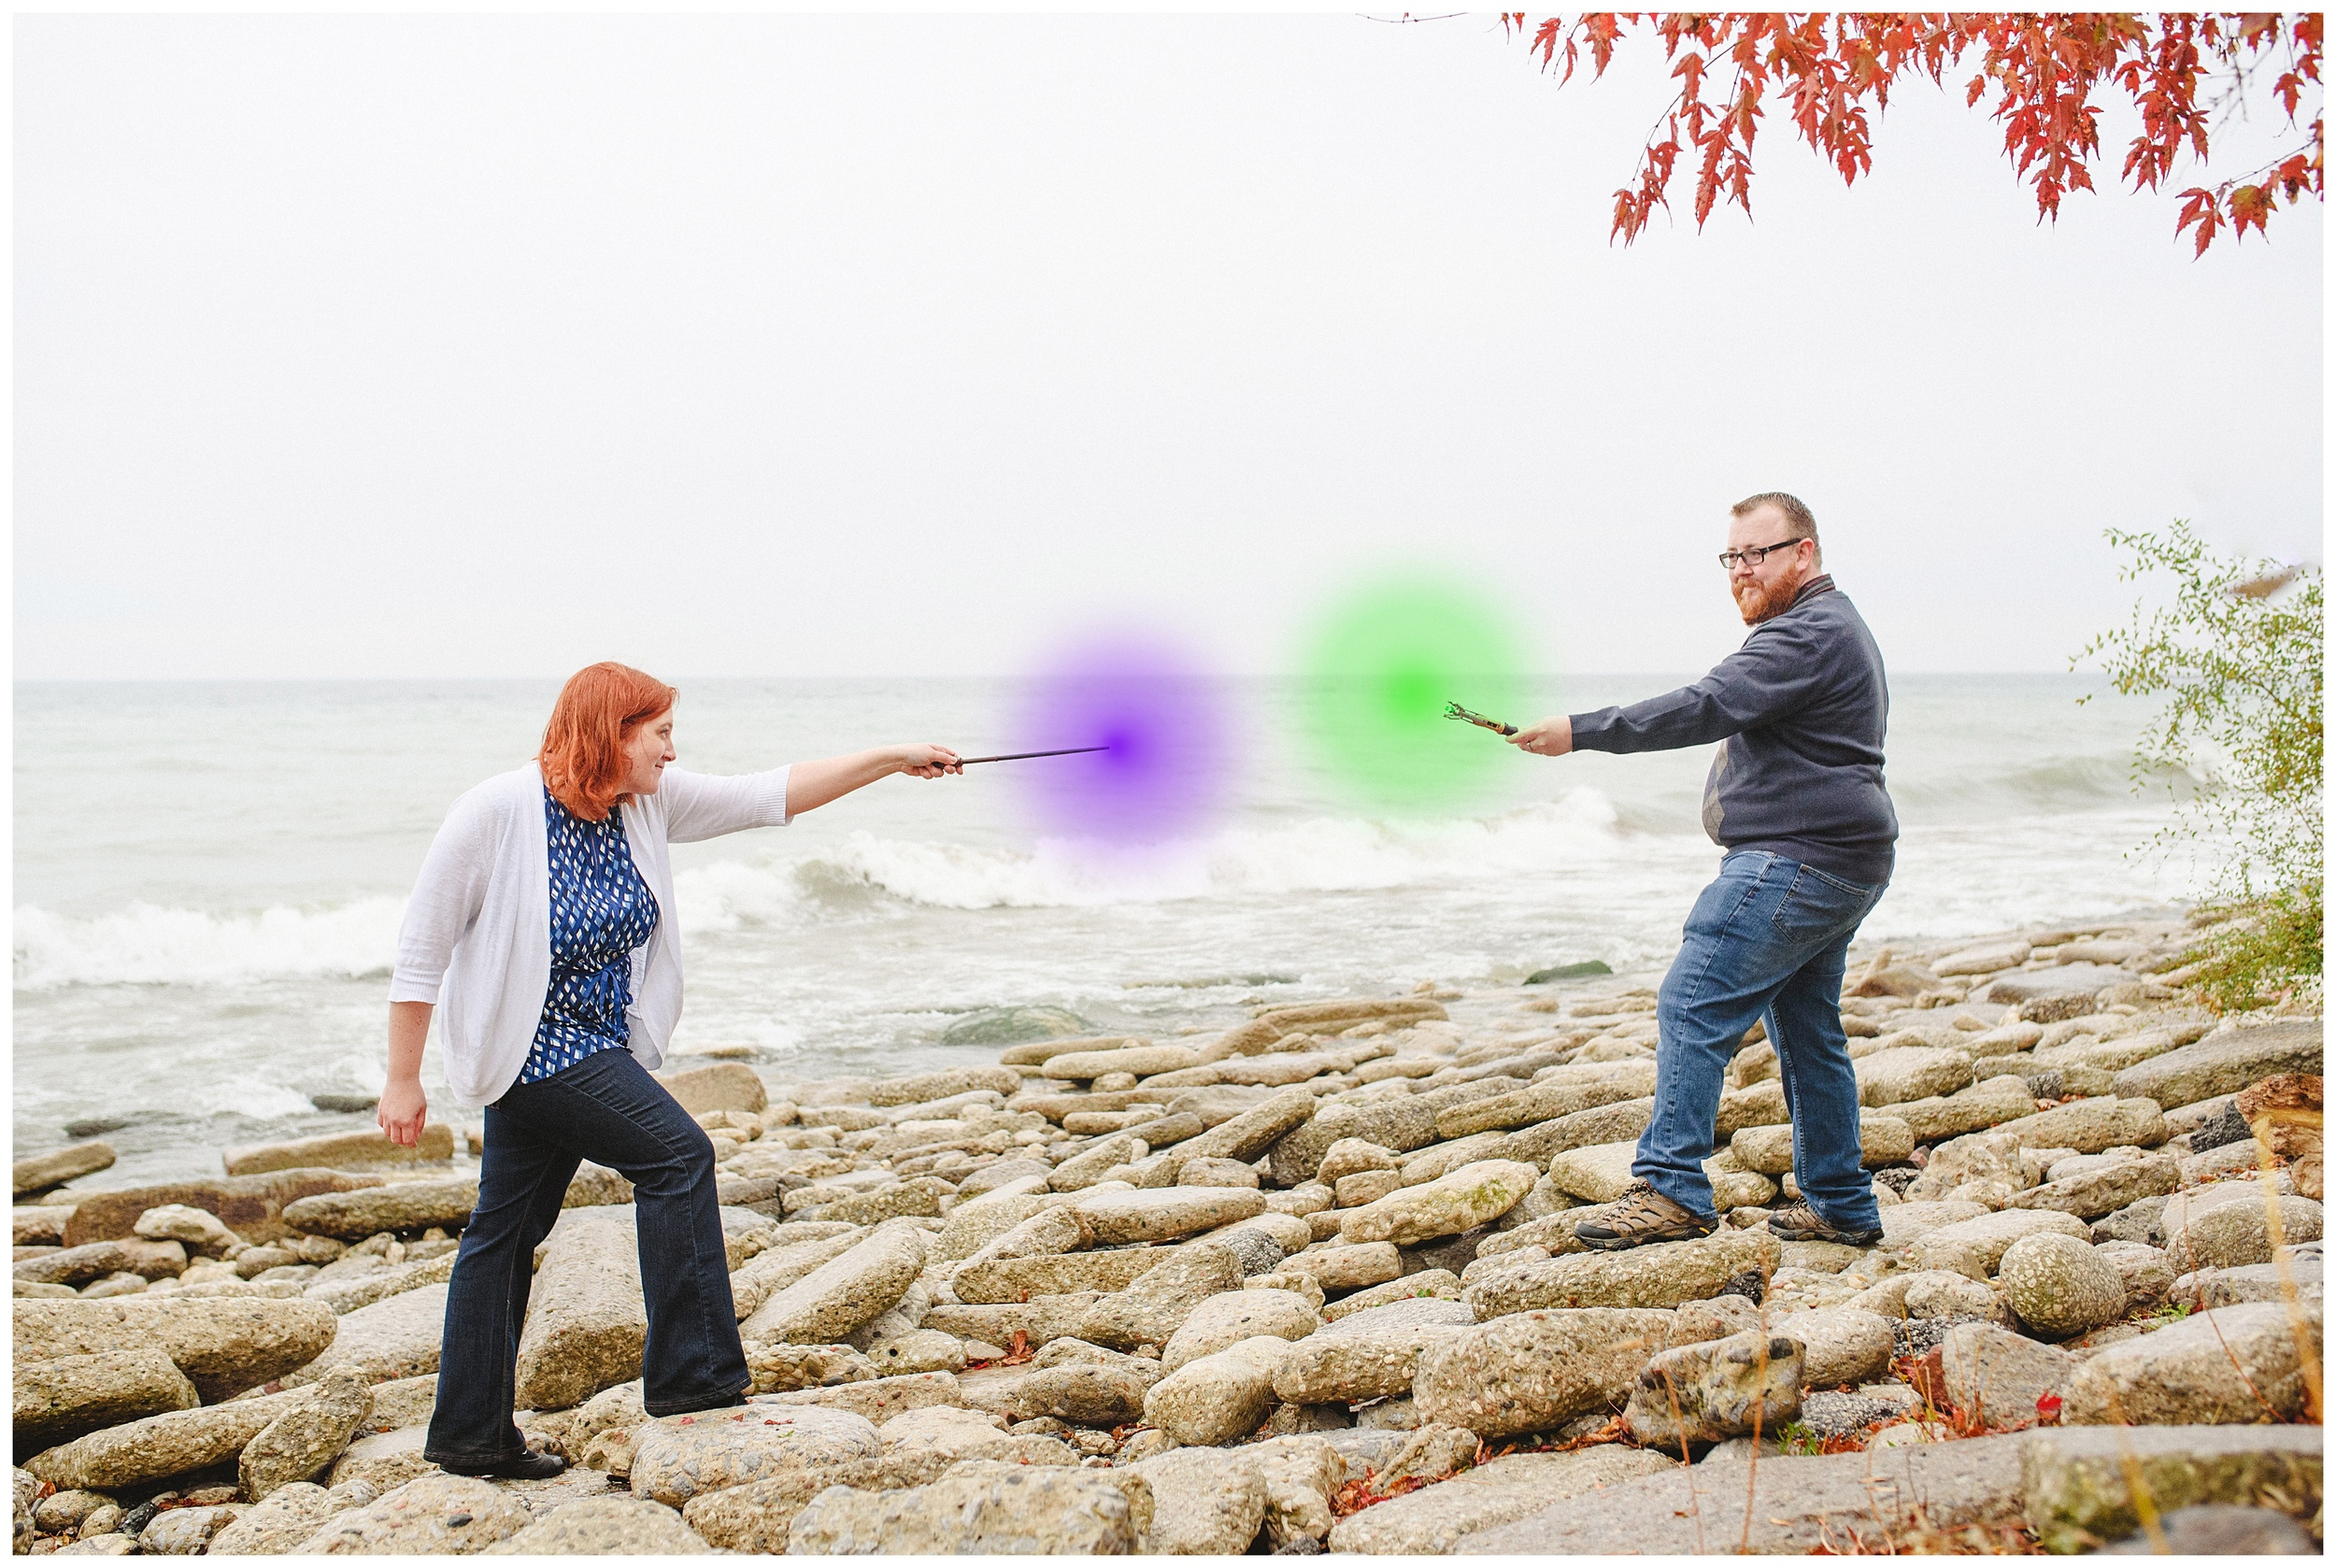 Arynn Photography, Scarborough Bluffs engagement shoot, Toronto Weddding Photographer, Durham Wedding Photographer, Geeky Engagement, Harry Potter engagement, Harry Potter Wands, Wand duel